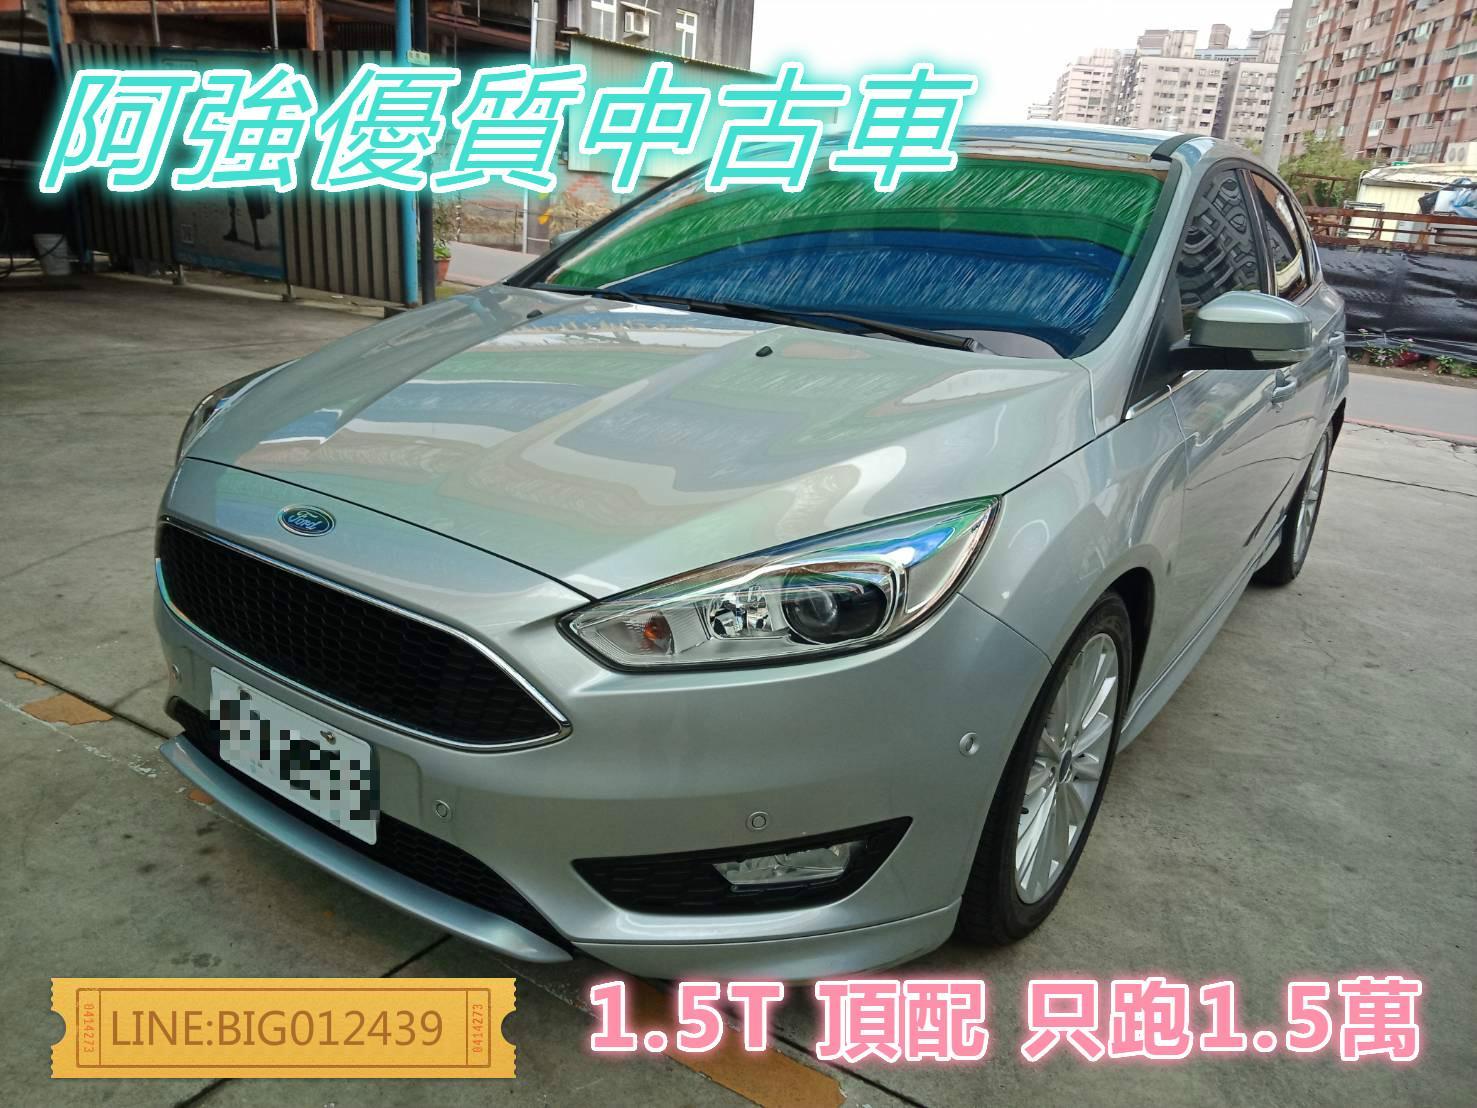 FOCUS 1.5T 頂配 跑1.5萬 全額貸 免頭款 低利率 超貸 車換車